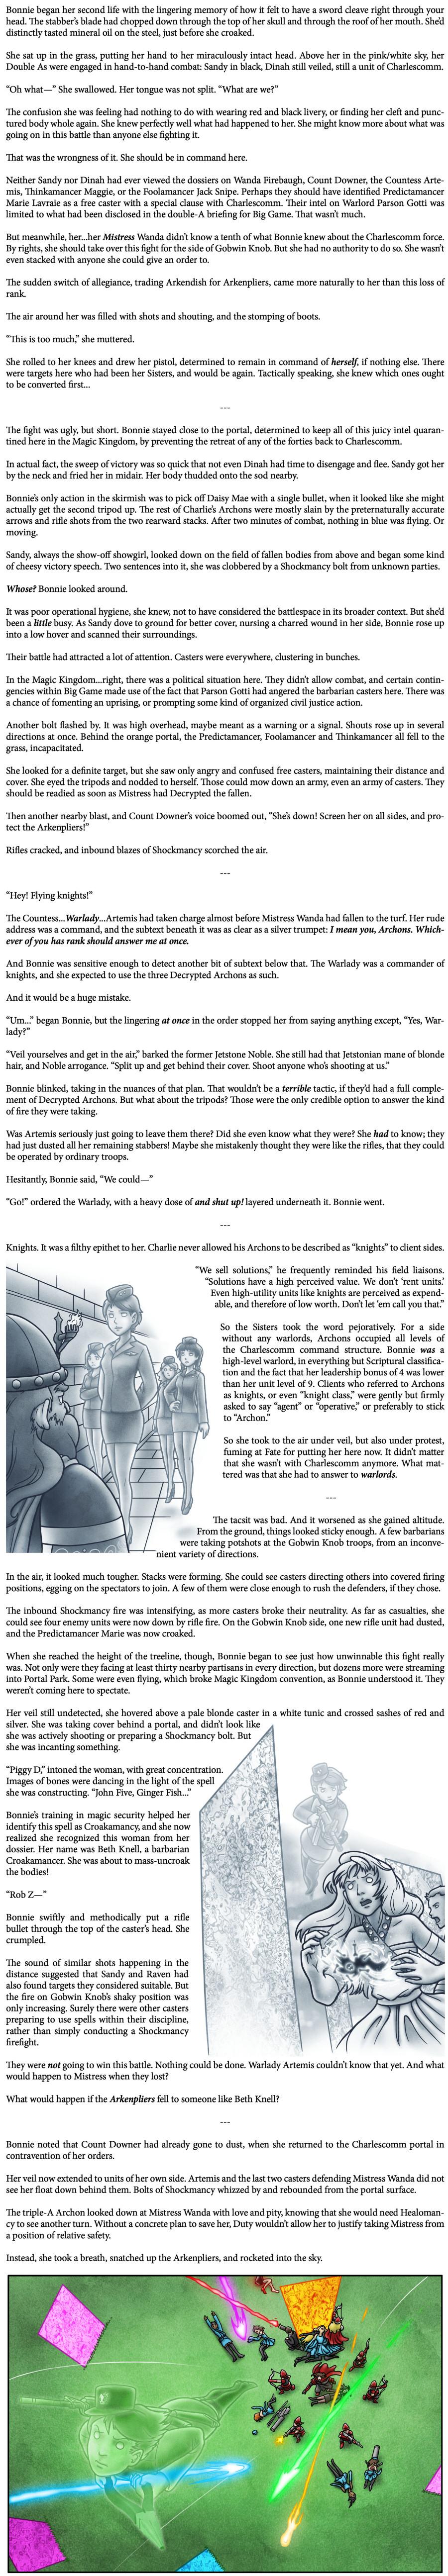 Comic - Book 3 - Page 136